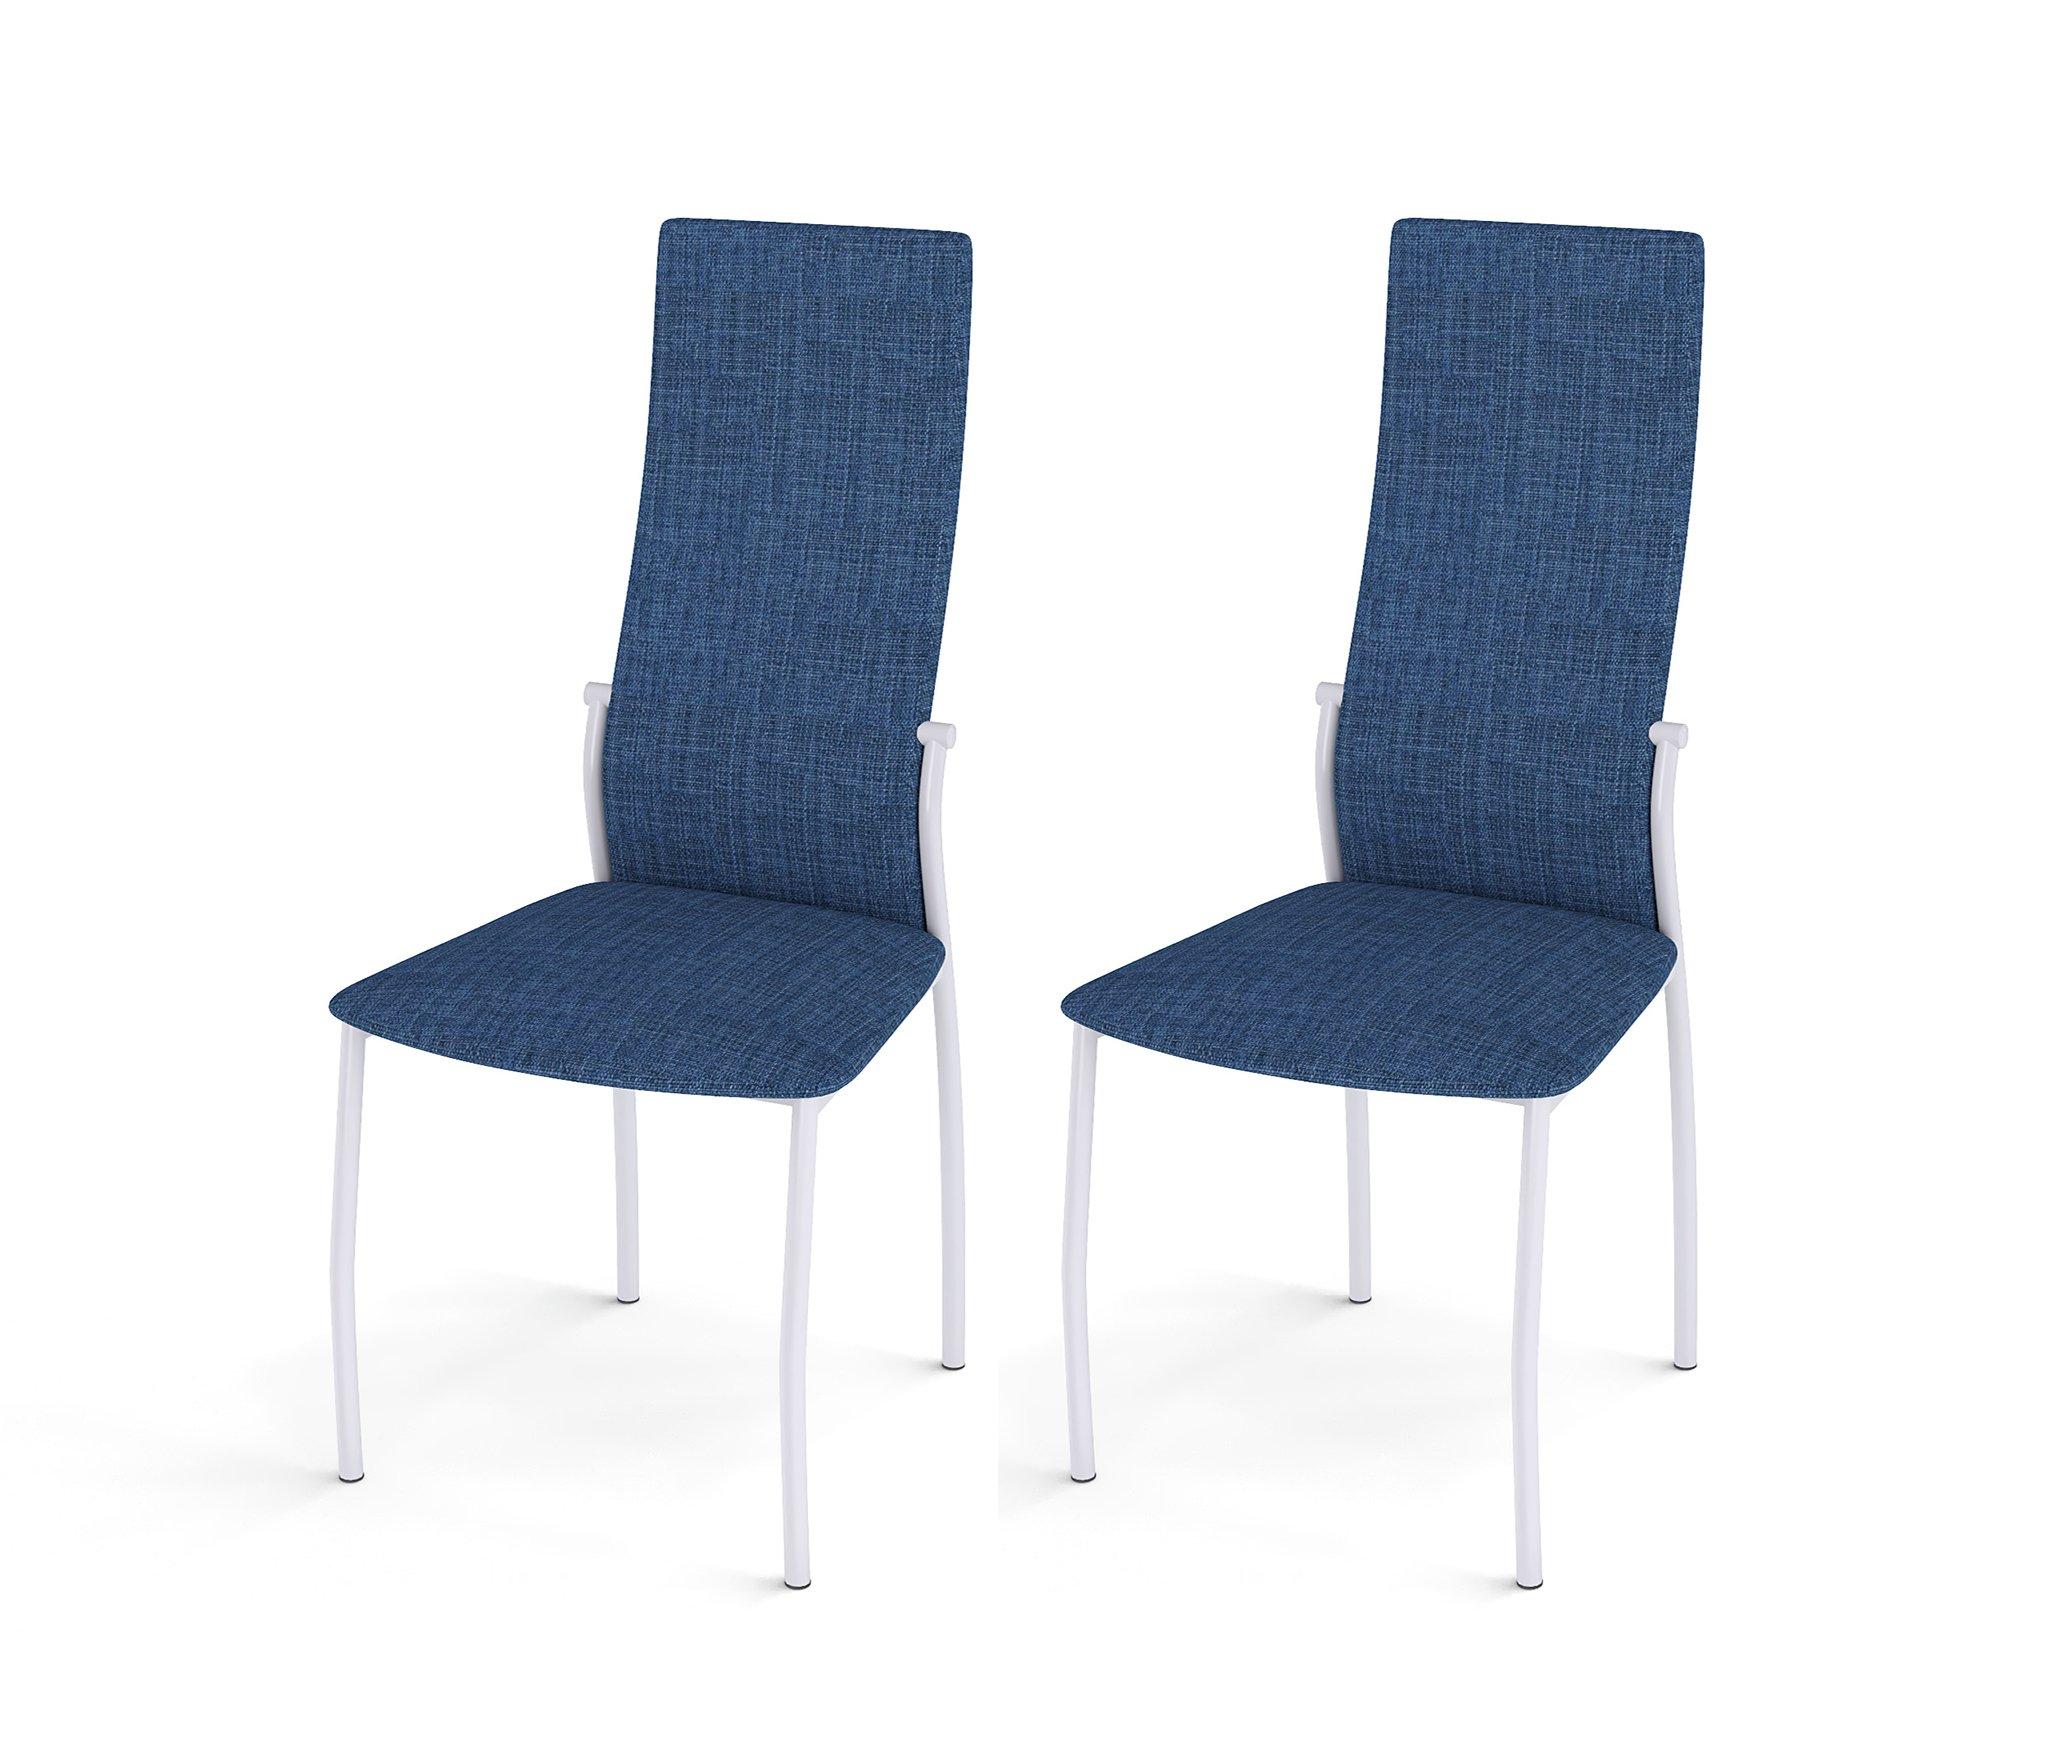 Стул Галс белый каркас /ткань №14 синий (в комплекте 2 шт.) недорого